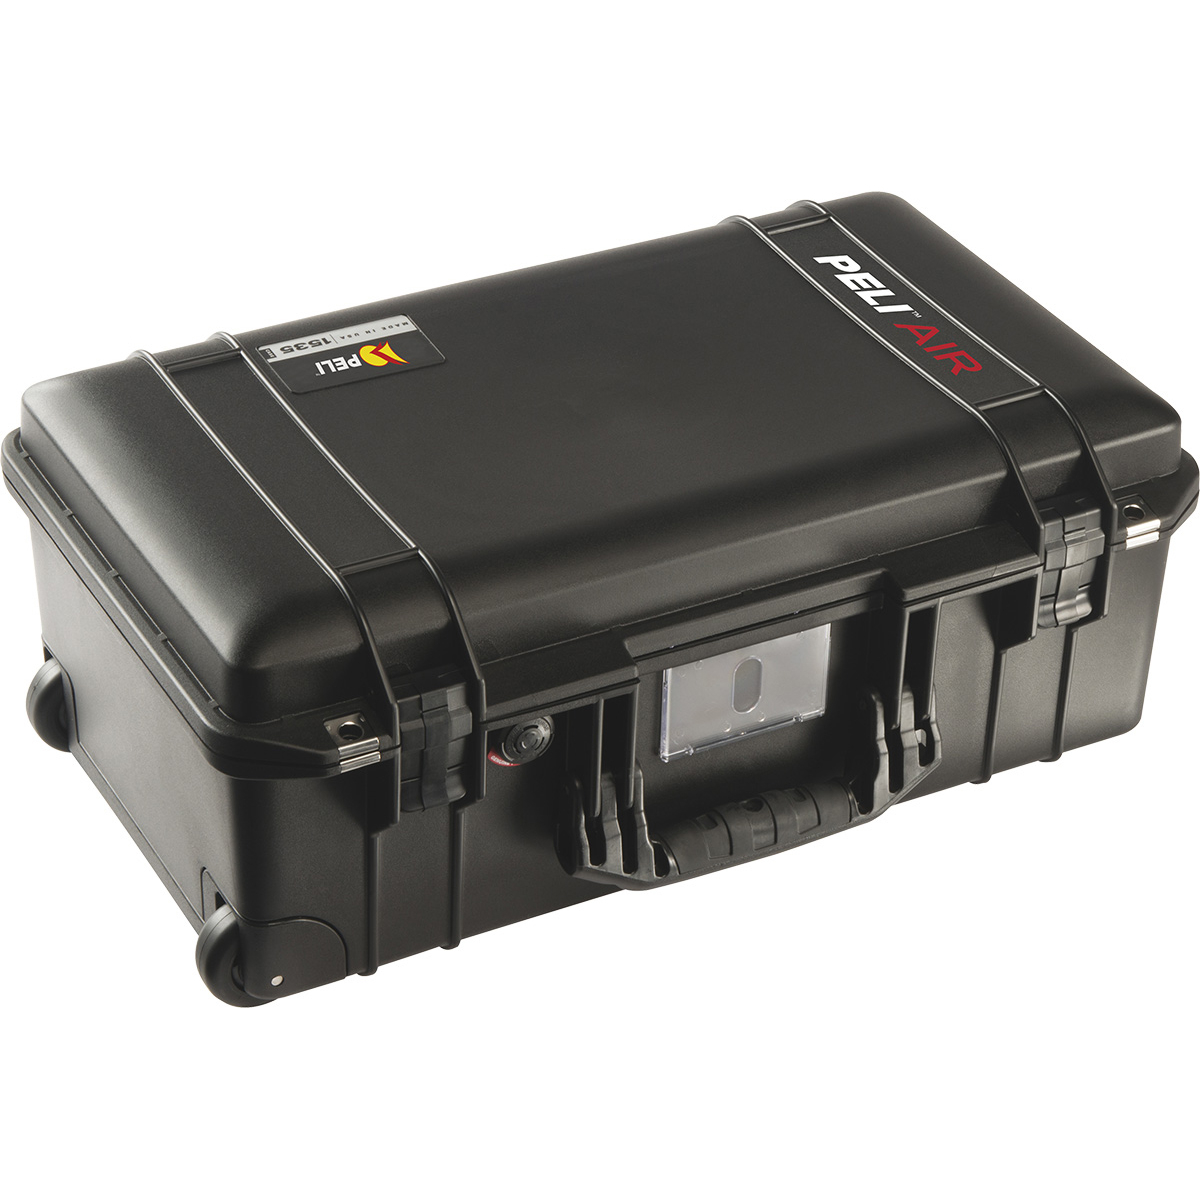 Peli Case 1535 AIR Met plukschuim